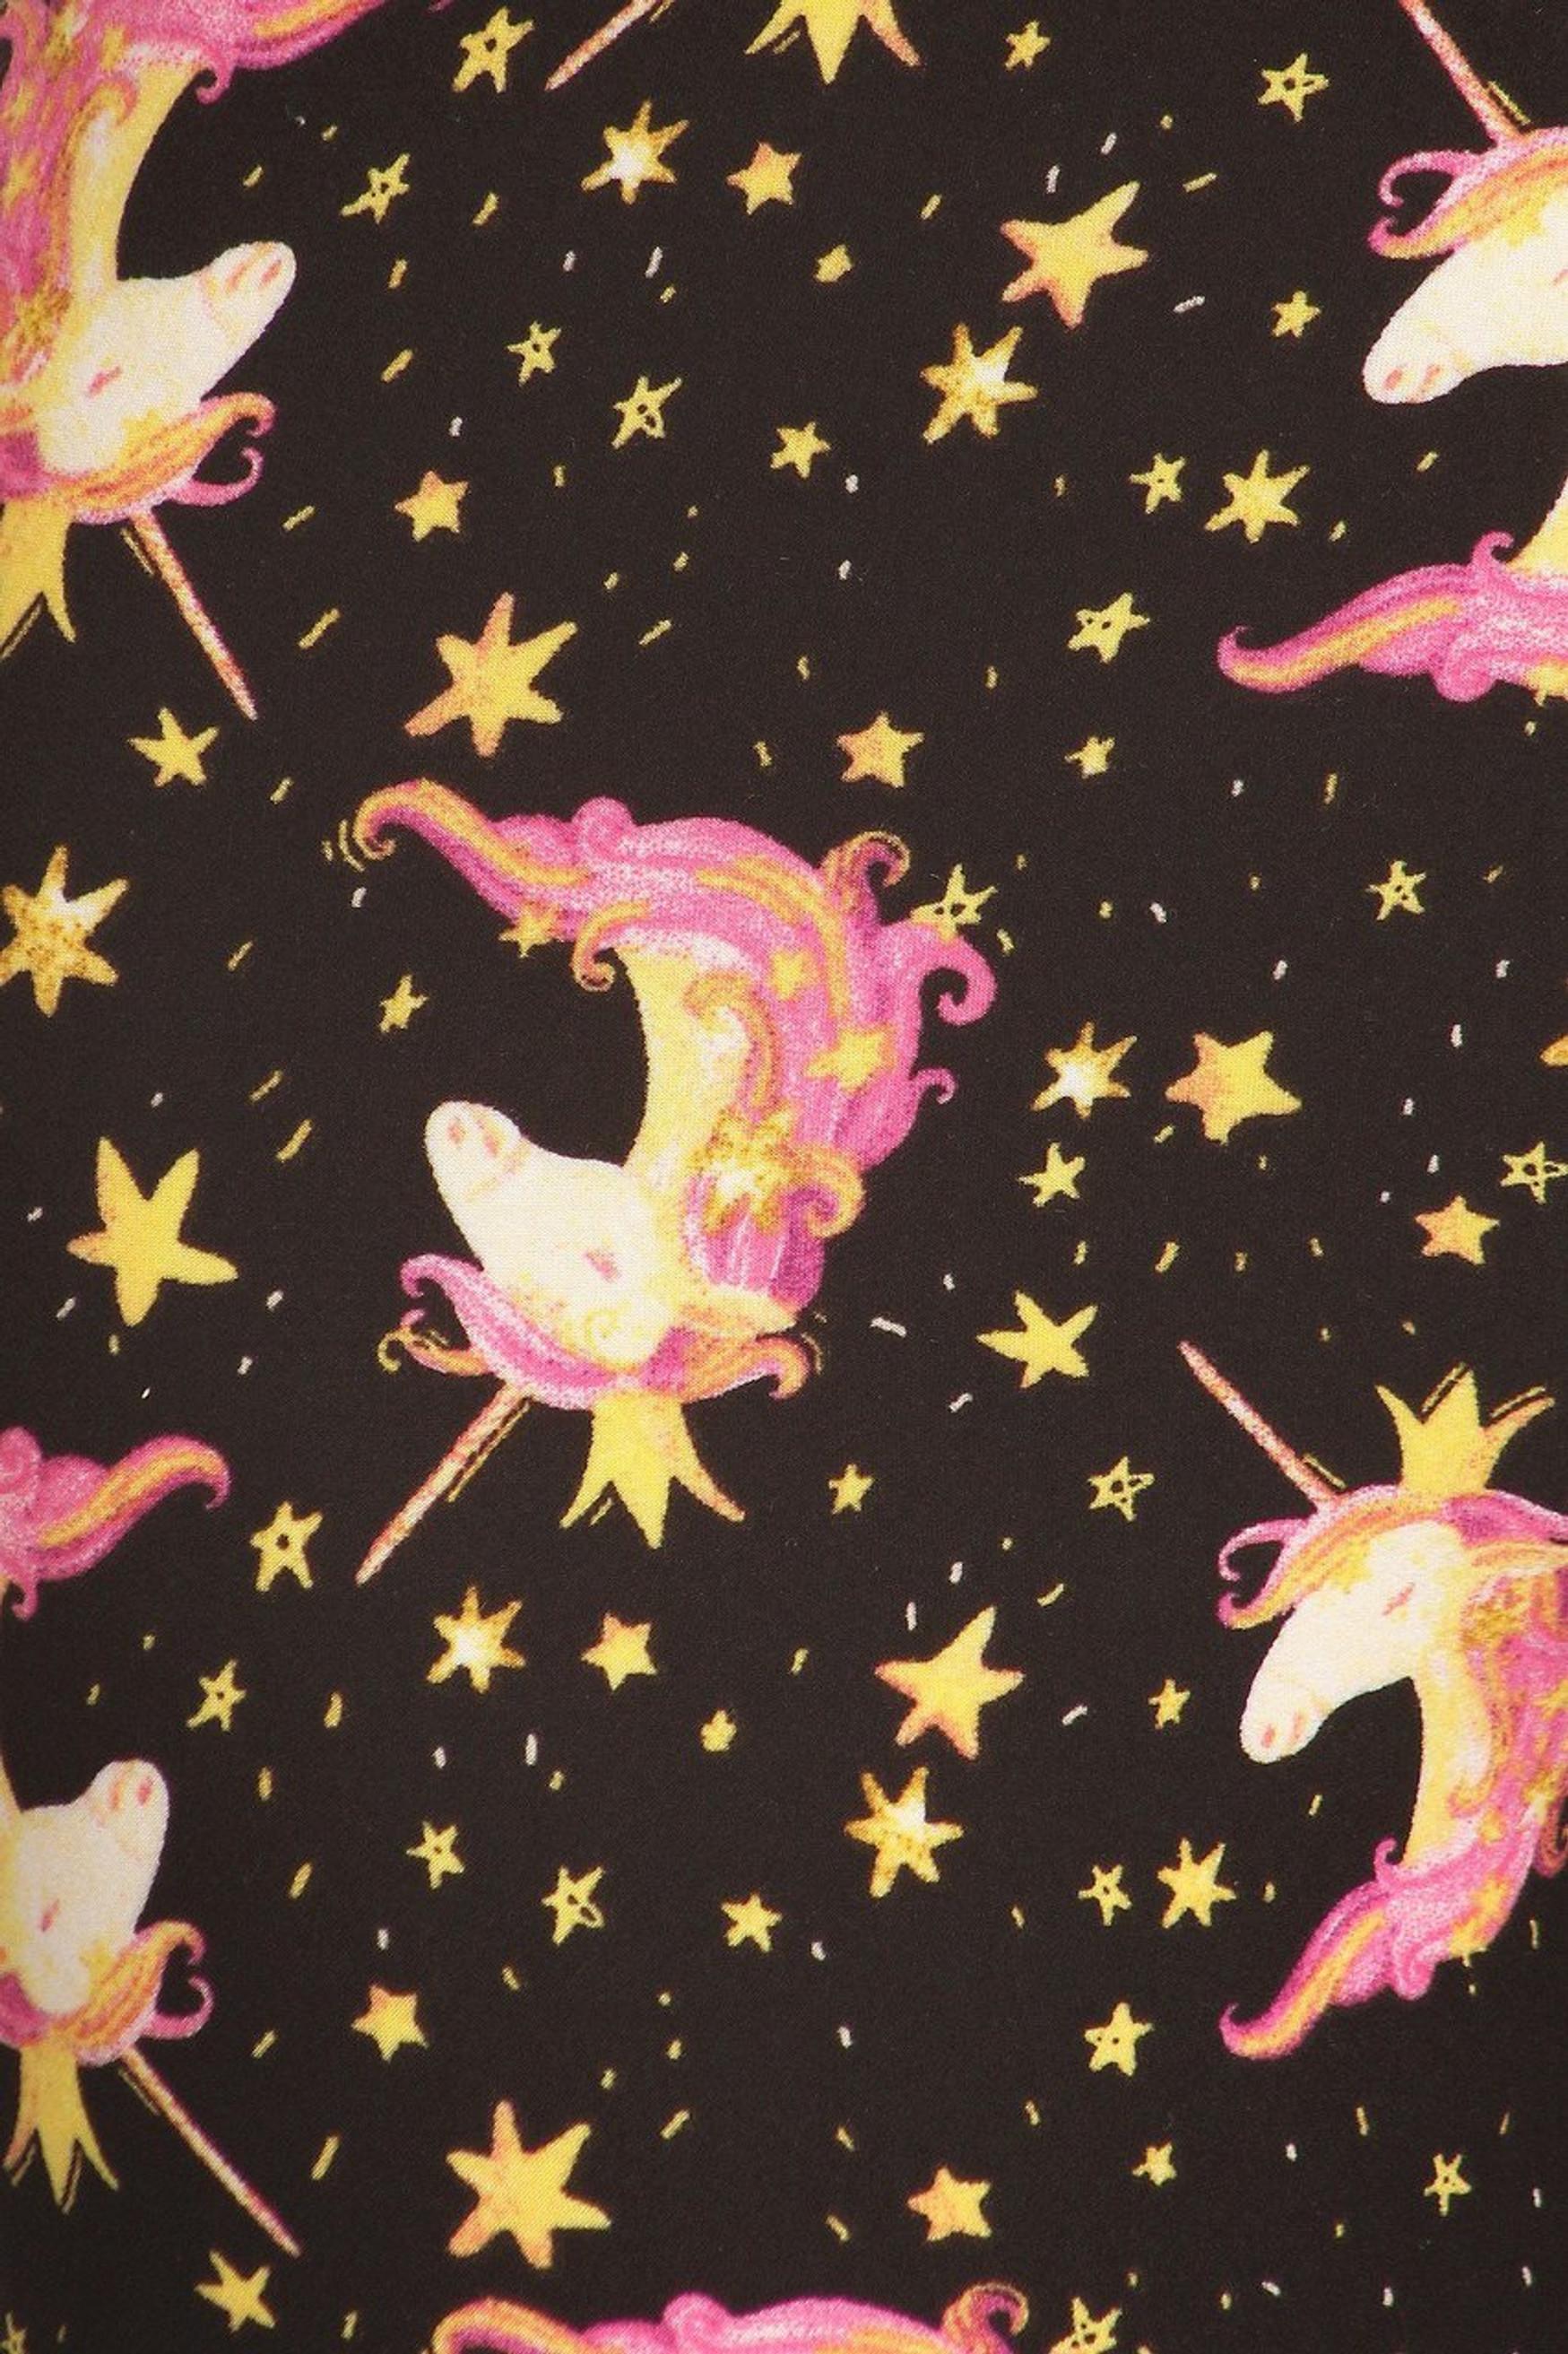 Twinkle Unicorn Plus Size Leggings - 3X-5X - LIMITED EDITION